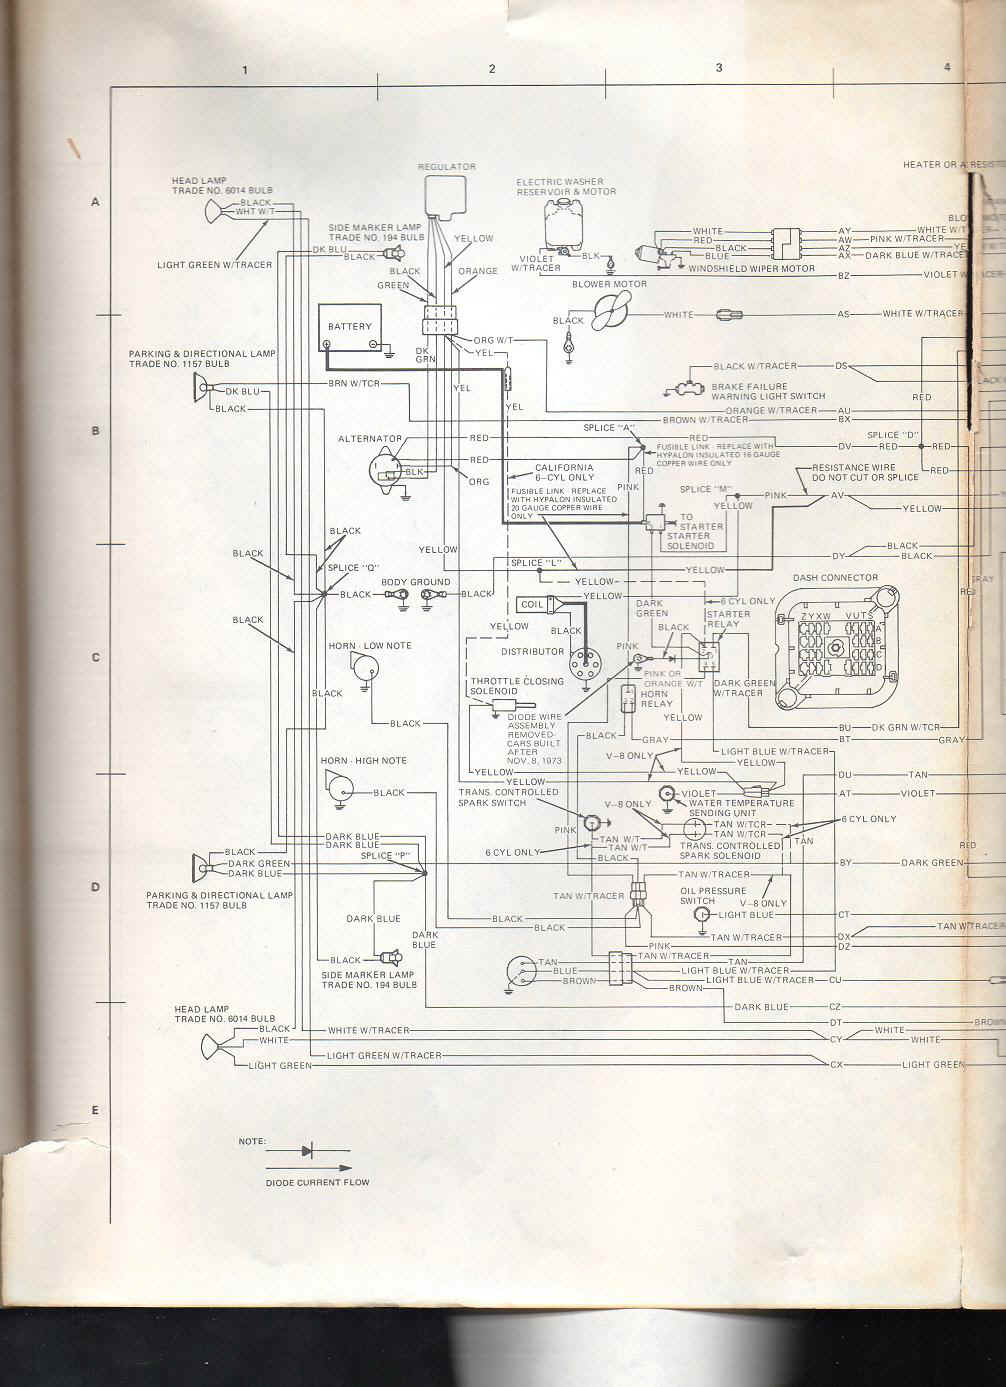 amc amx wiring harness fd 7003  amc hornet wiring diagram schematic wiring  amc hornet wiring diagram schematic wiring